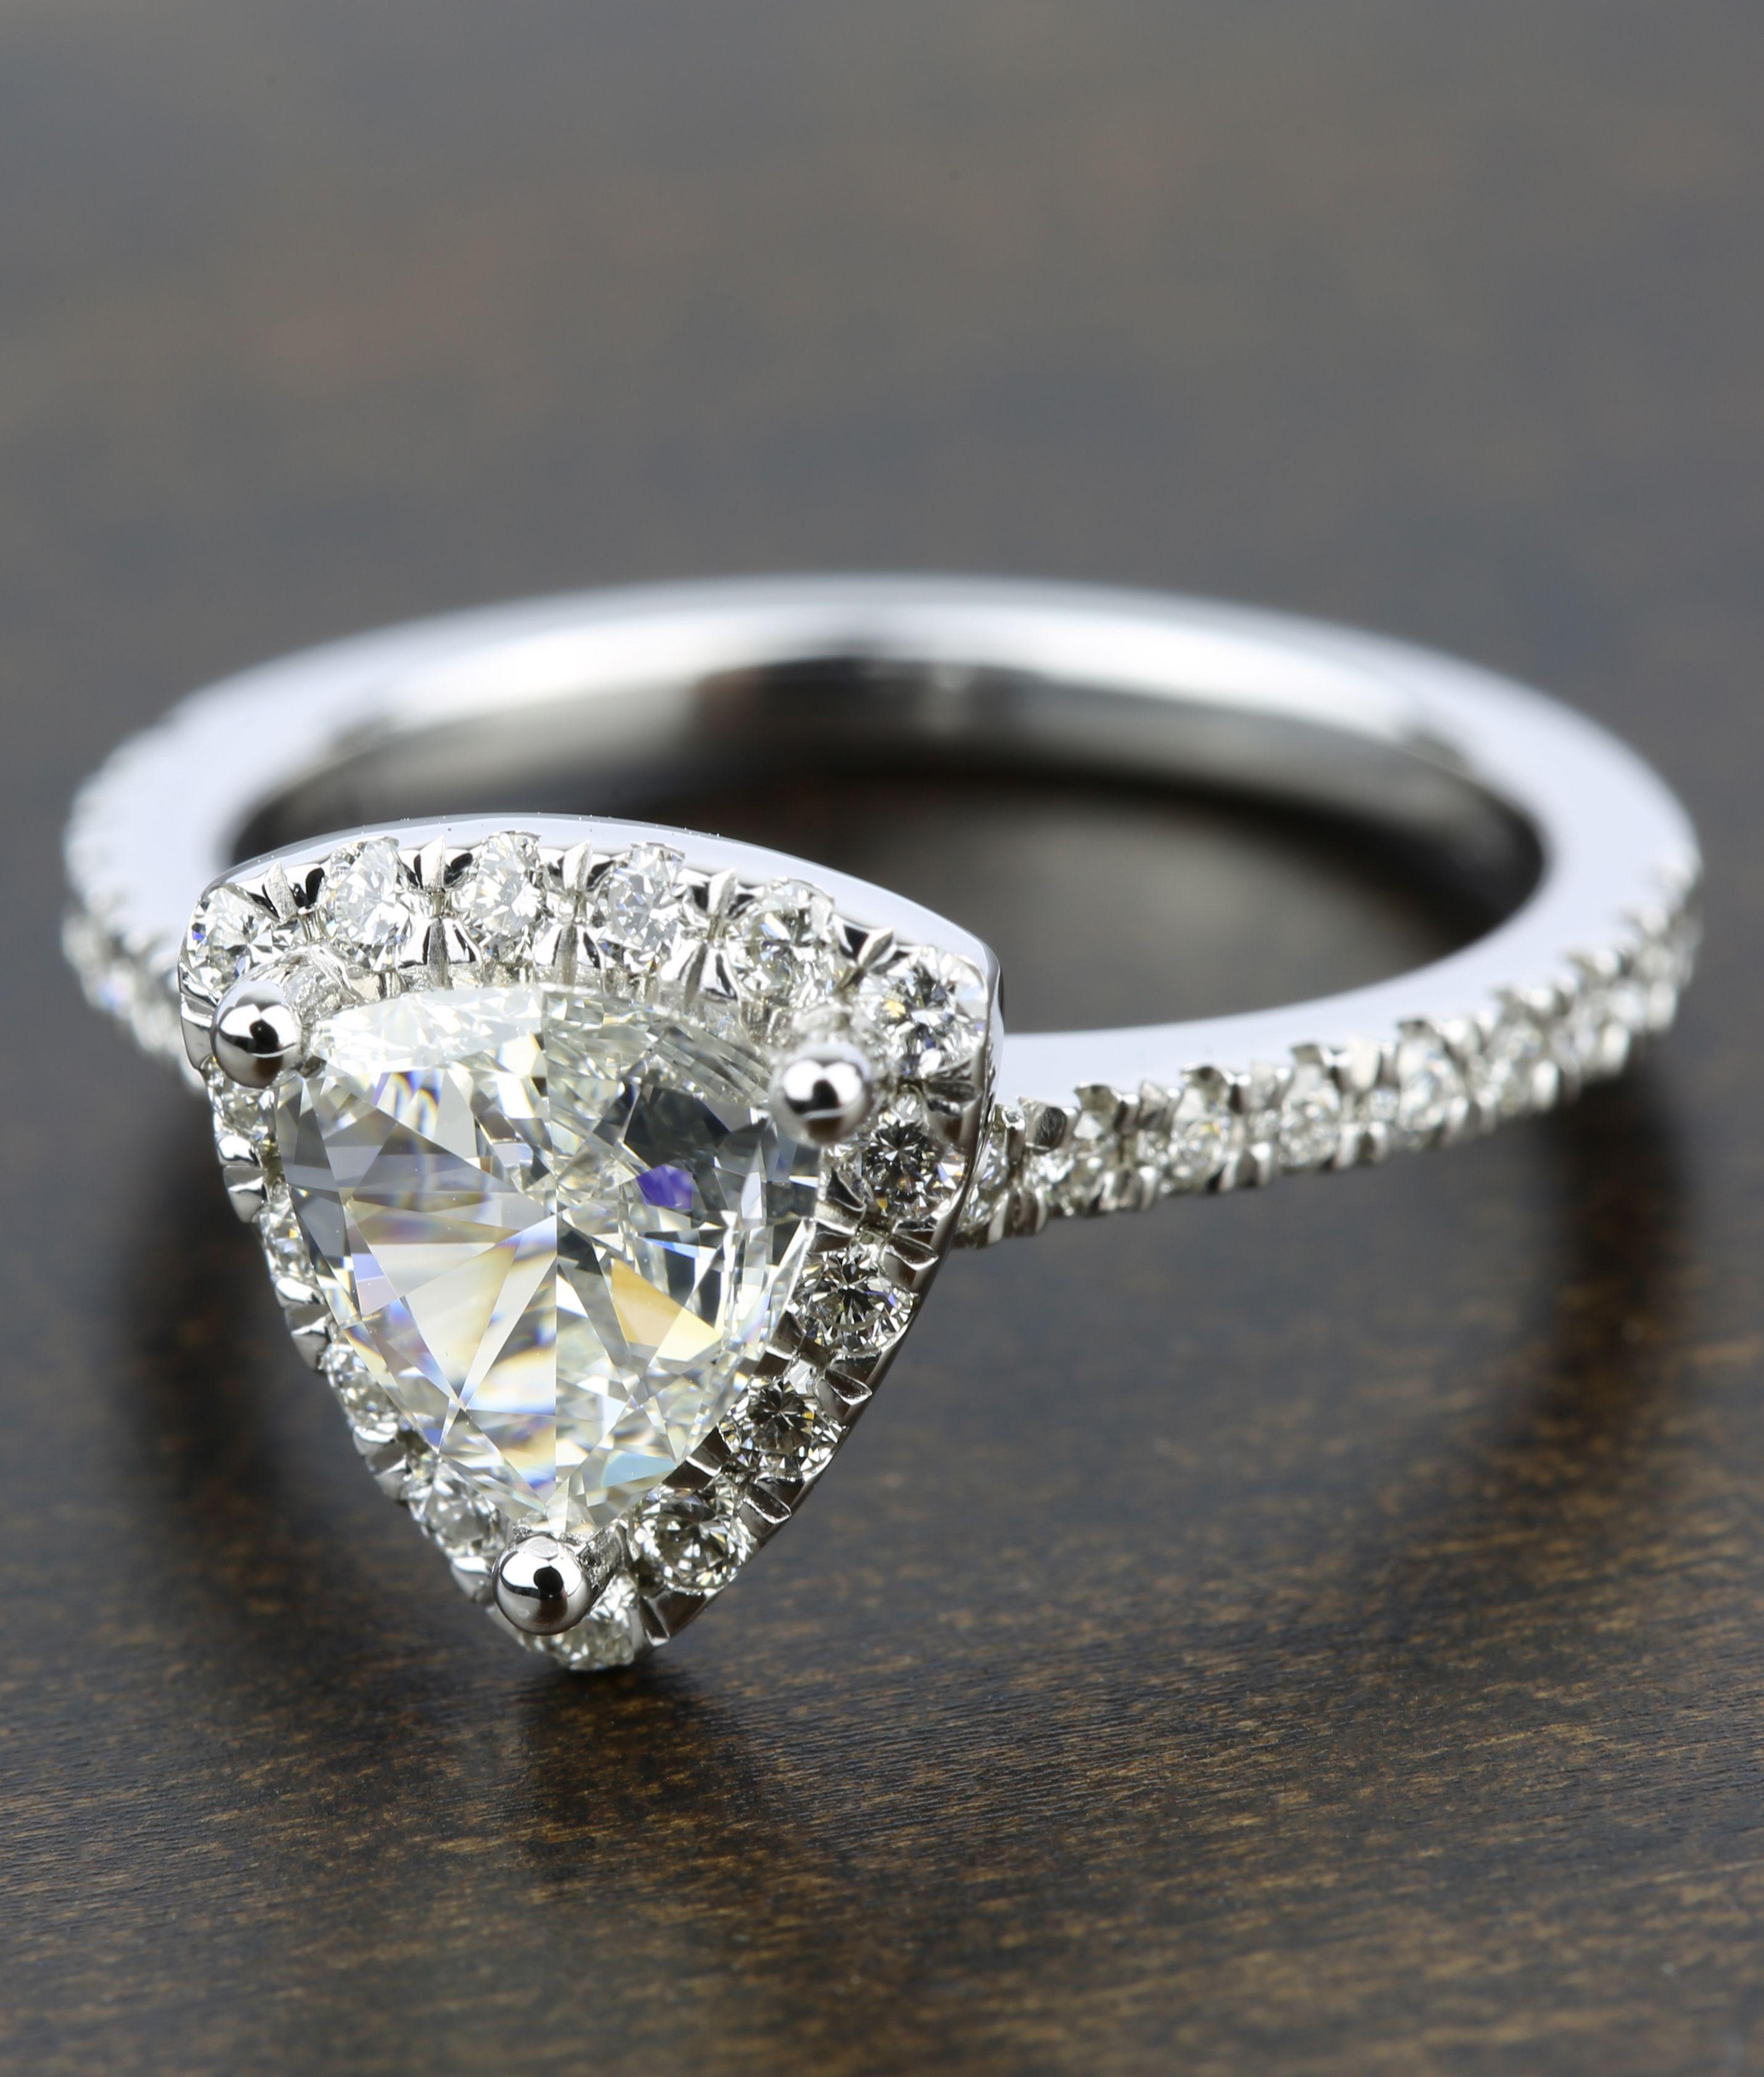 Trillion Diamond Halo Engagement Ring in White Gold Halo